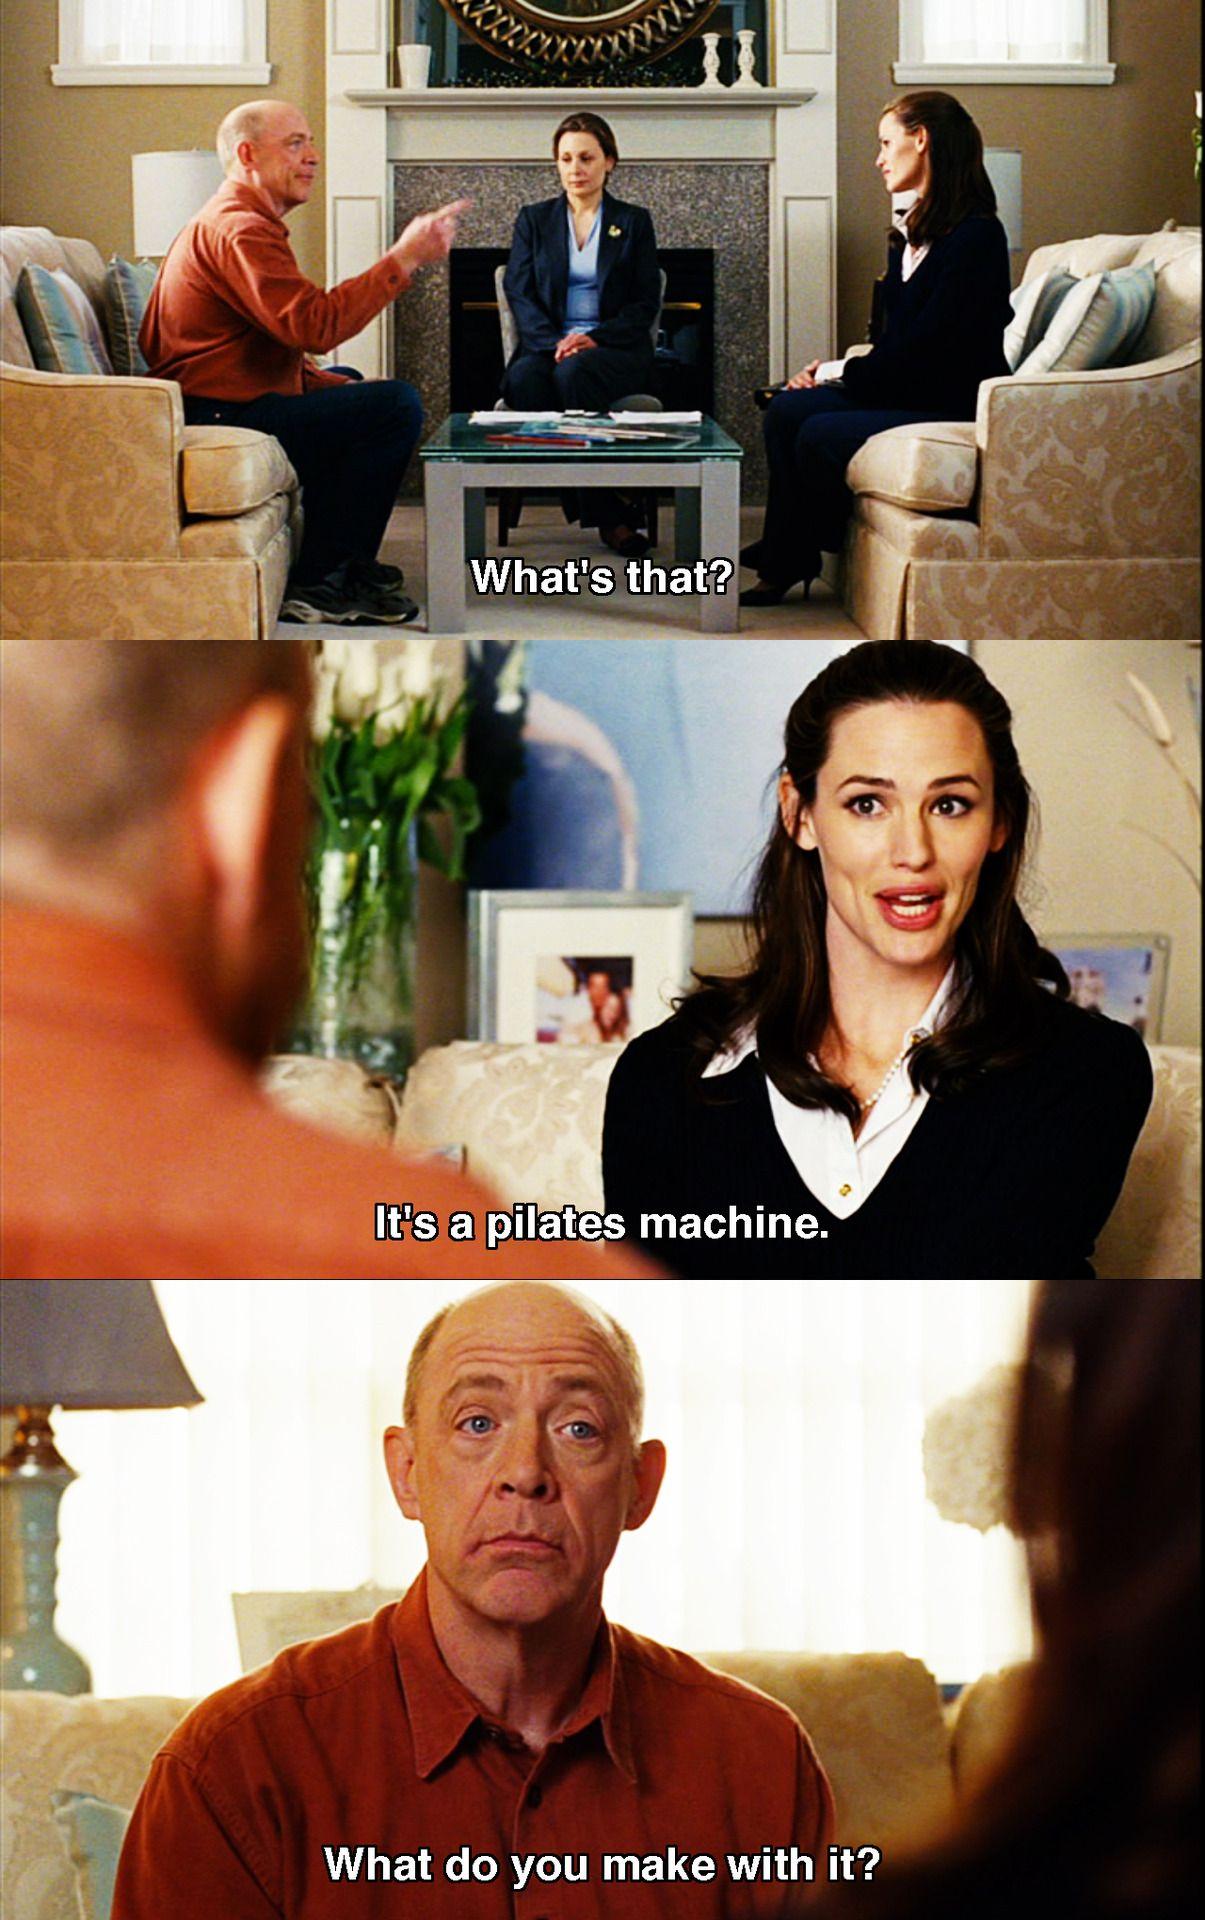 funny recognizable movie meme